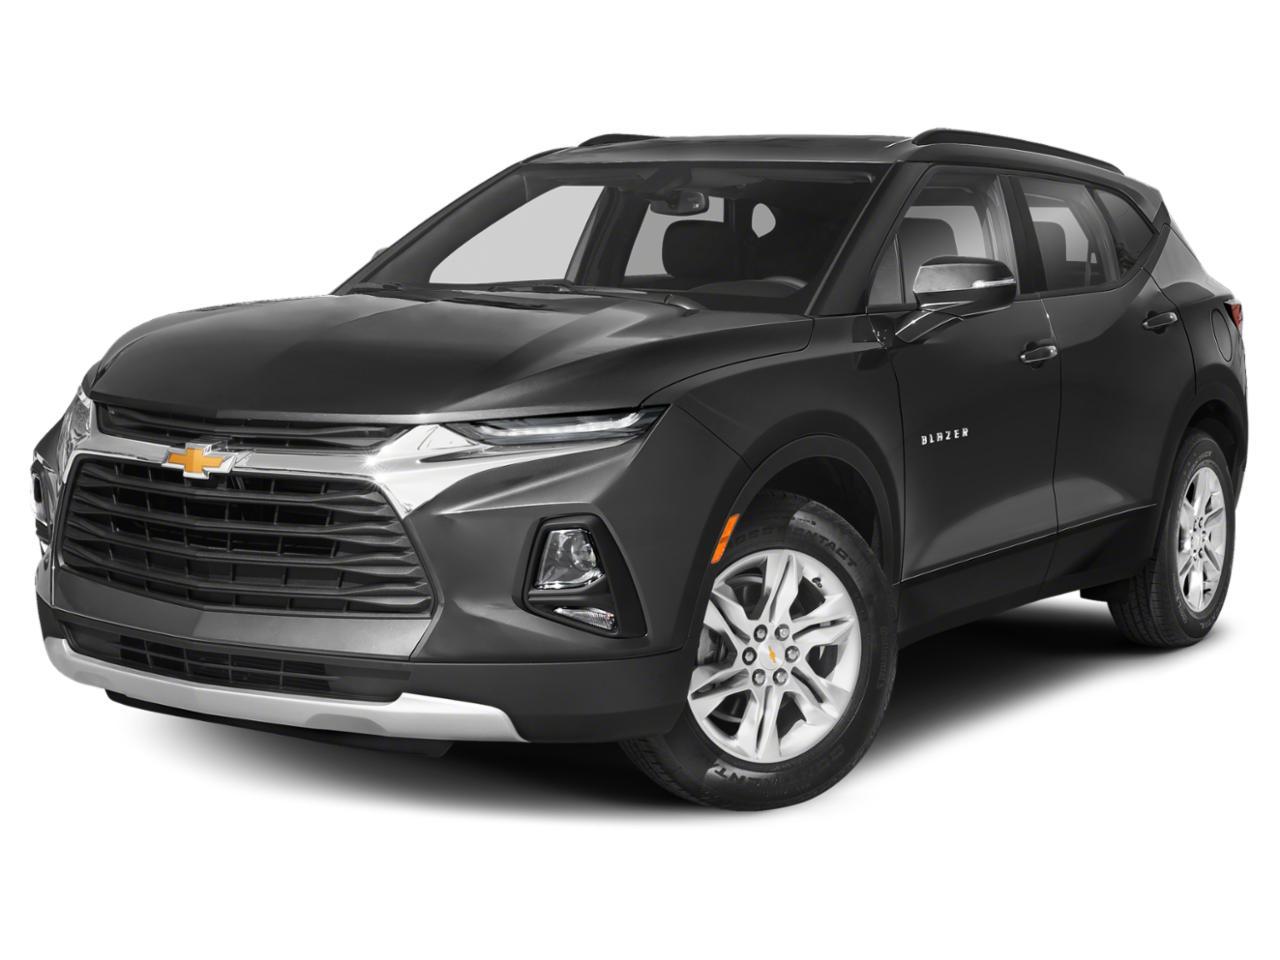 2021 Chevrolet Blazer Vehicle Photo in SAINT JAMES, NY 11780-3219